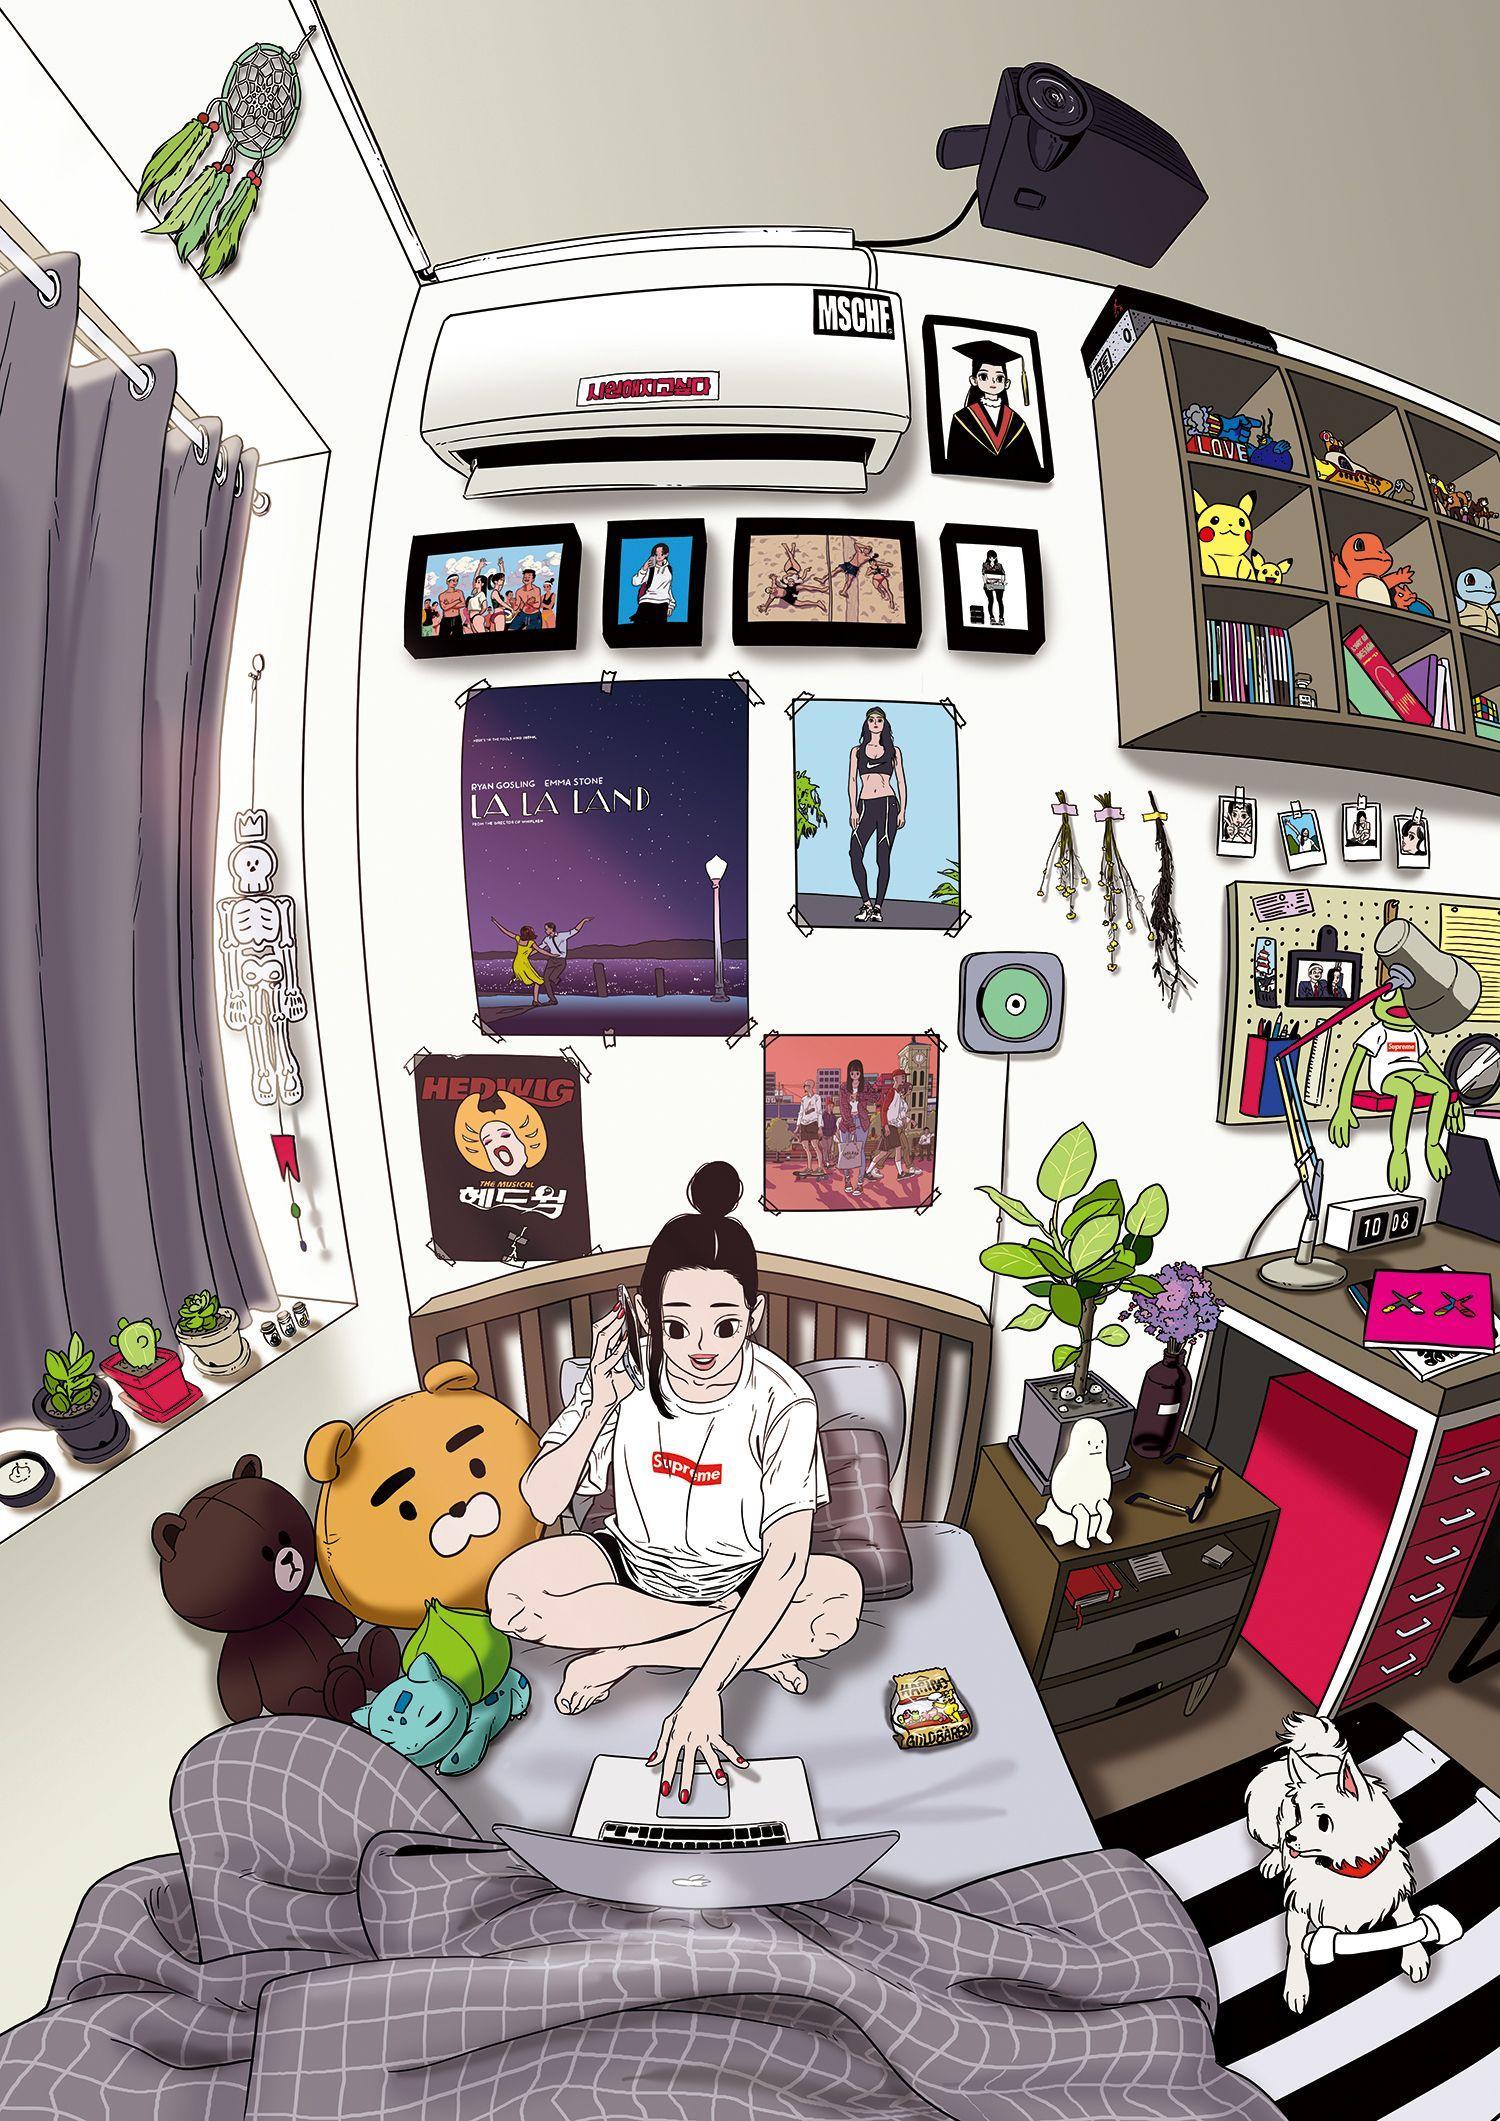 Anime Room Drawing : anime, drawing, Aesthetic, Anime, Wallpapers, Wallpaper